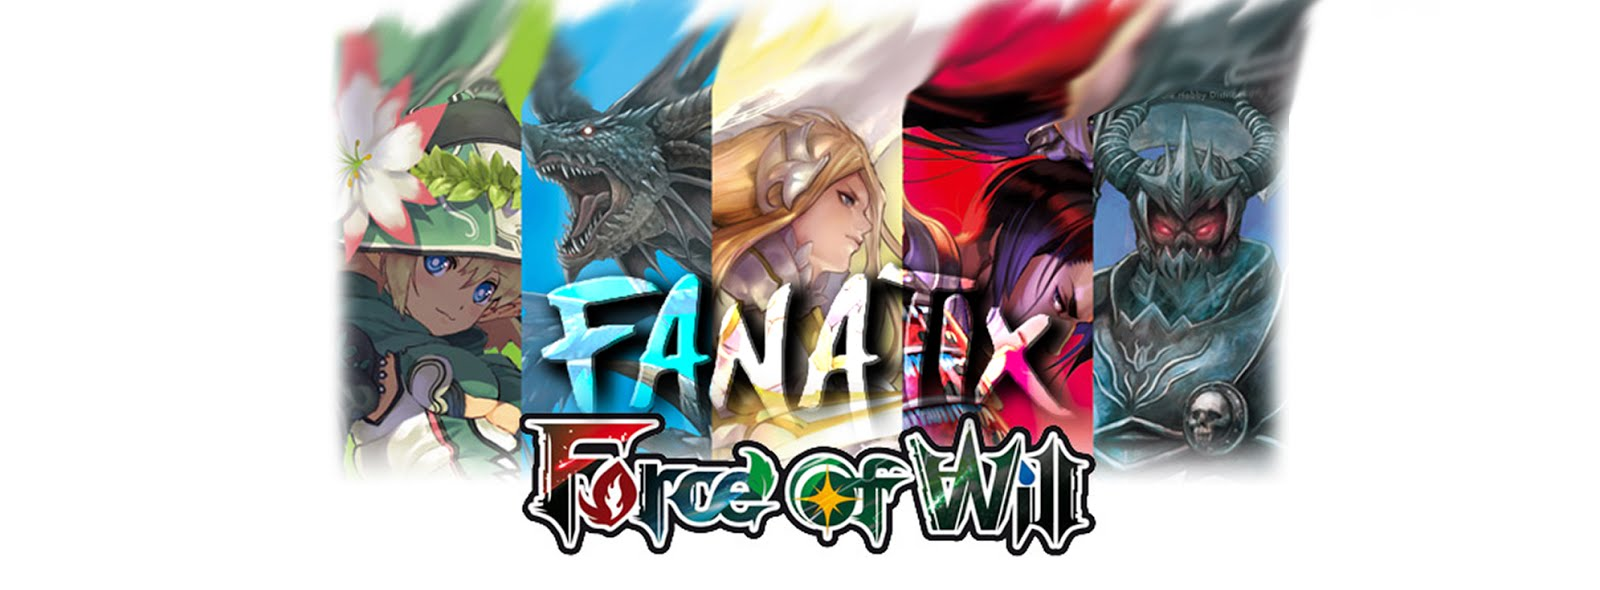 Fanatix FoW, Deck Teks, Articles and More